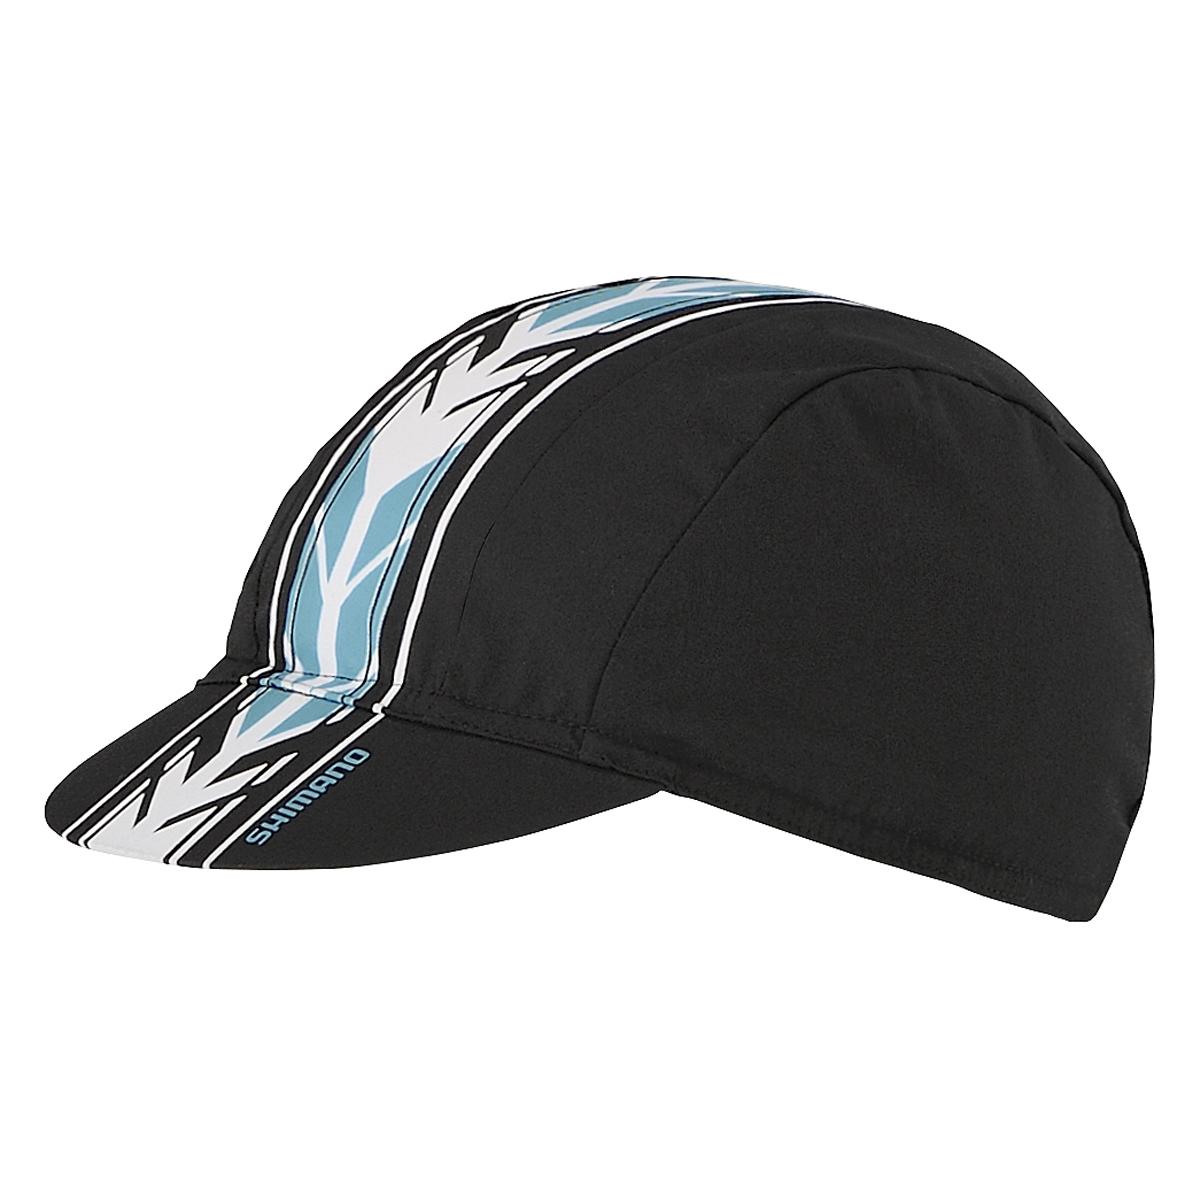 Shimano Czapka kolarska Racing kolor czarny one size